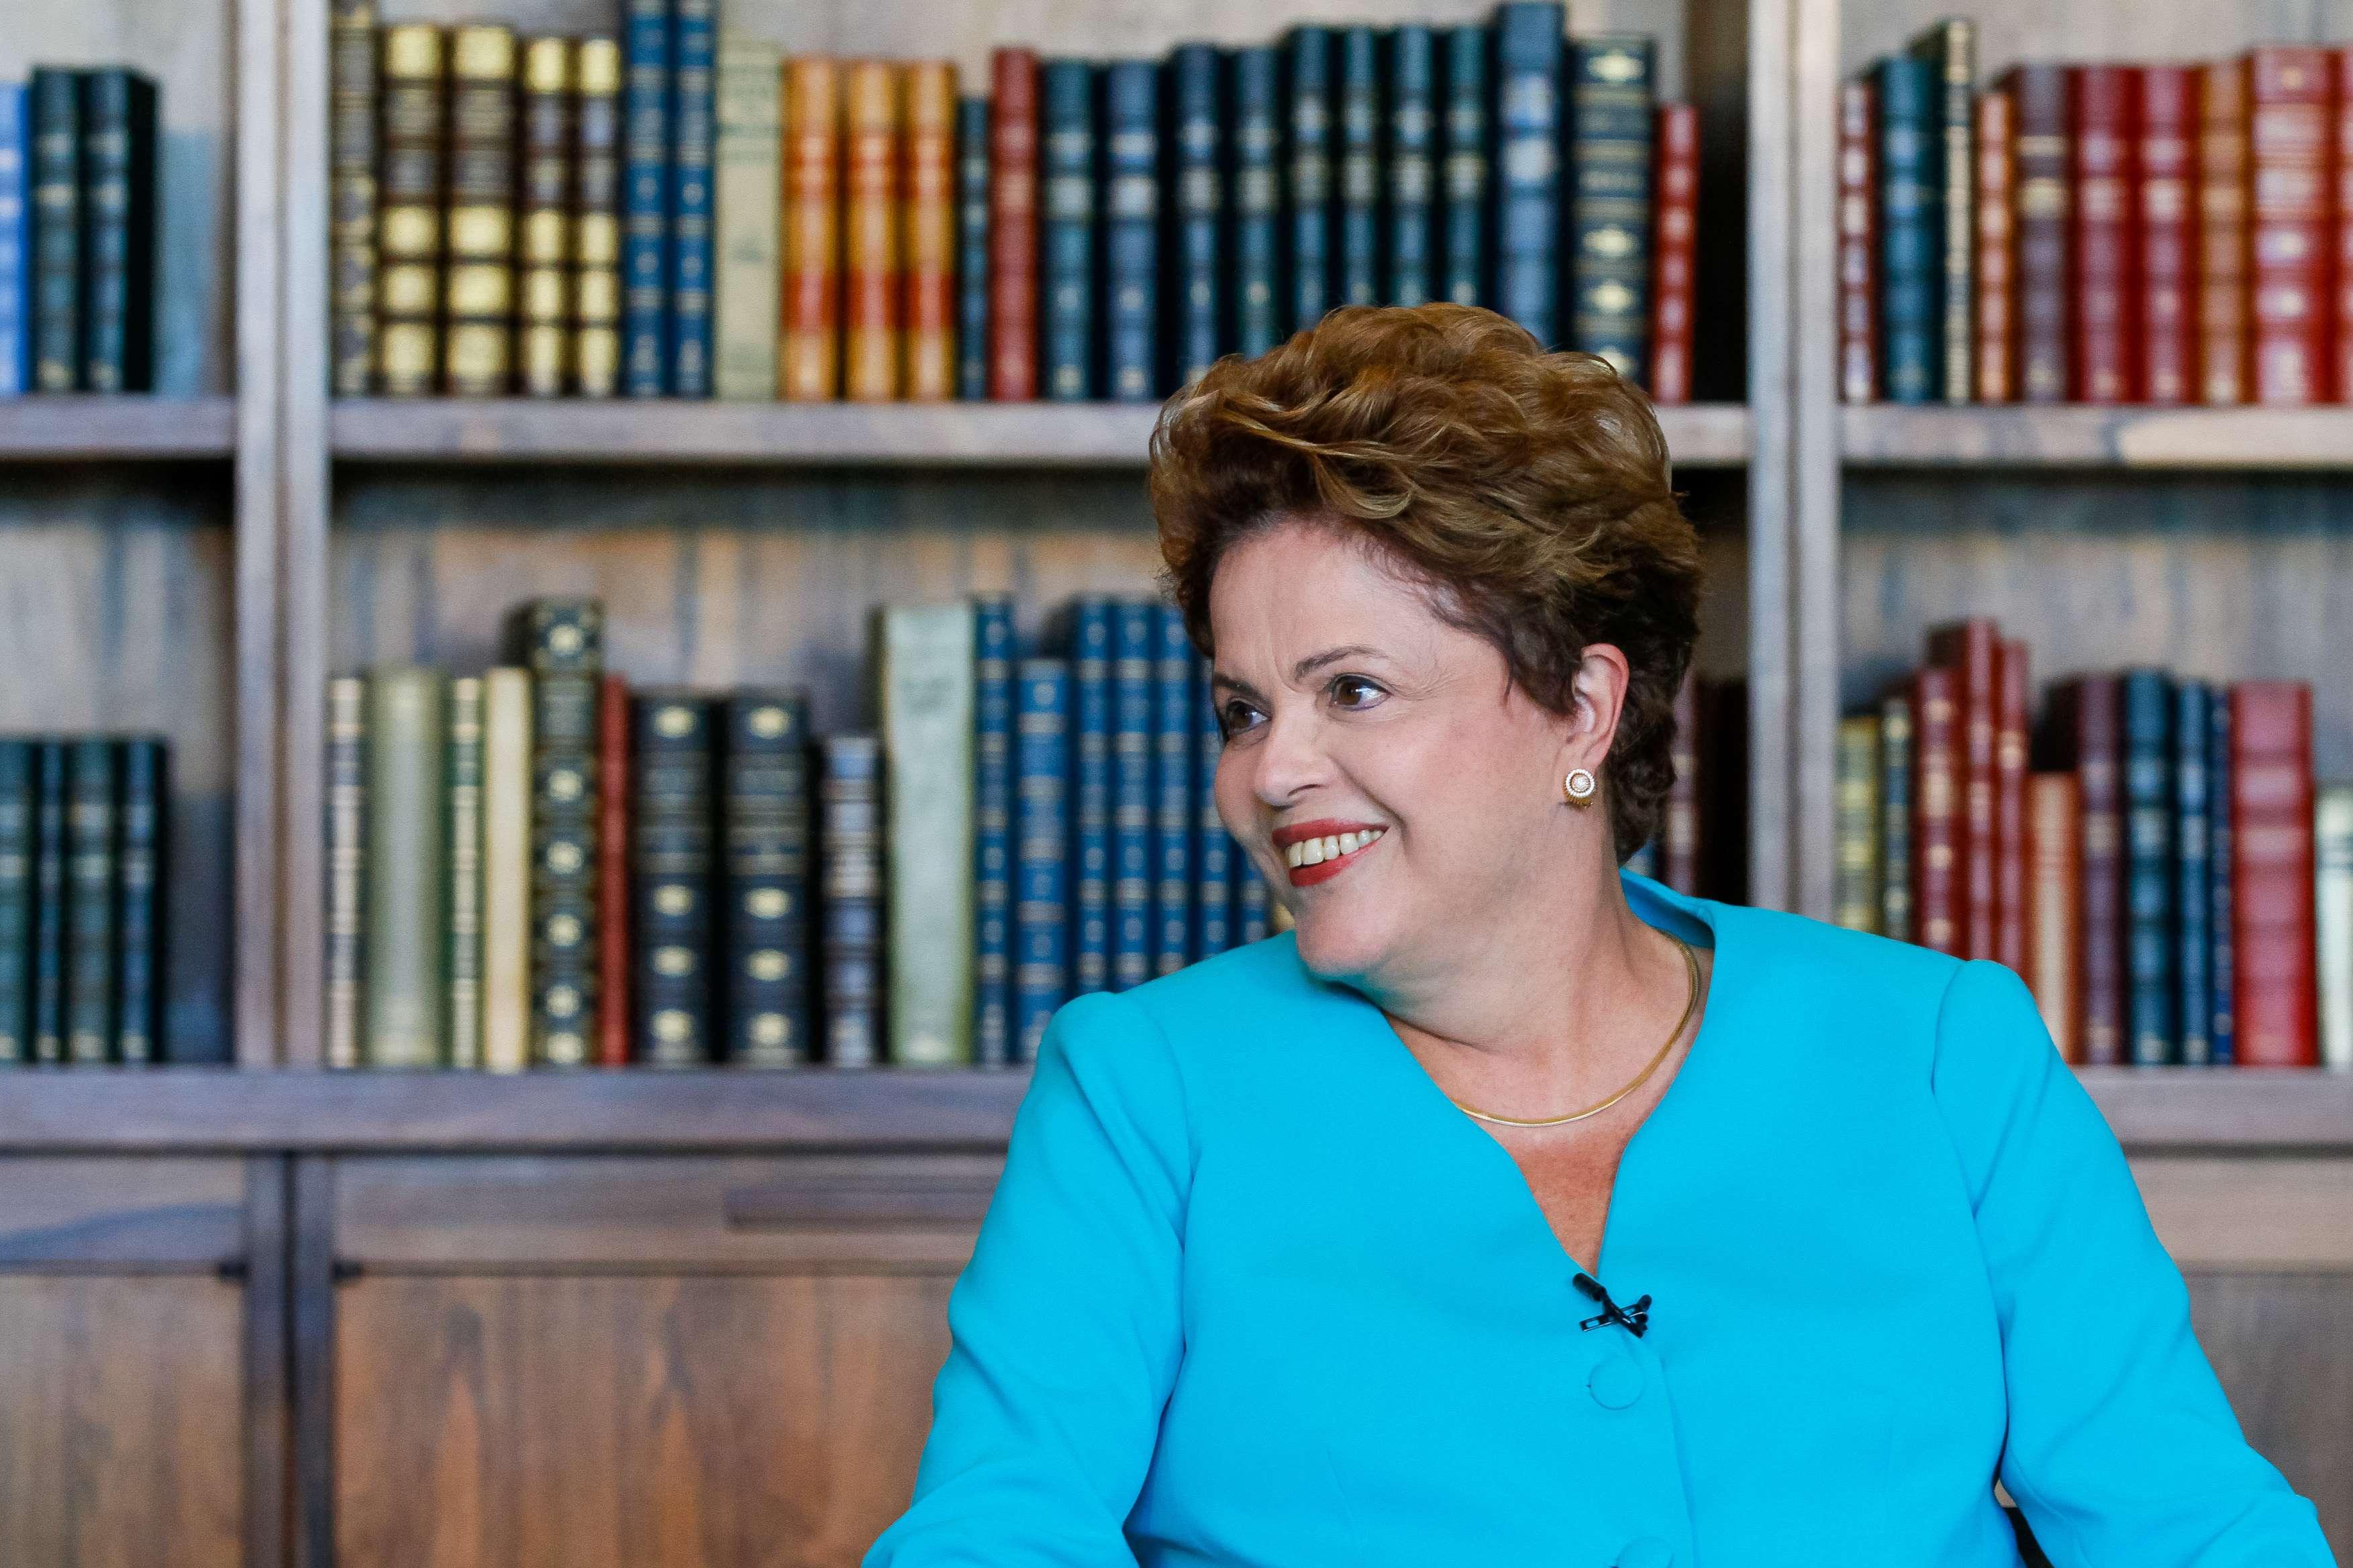 Dilma Rousseff usa mechas claras para iluminar o tom castanho Foto: Ichiro Guerra/ saladeimprensadilma13/Flickr